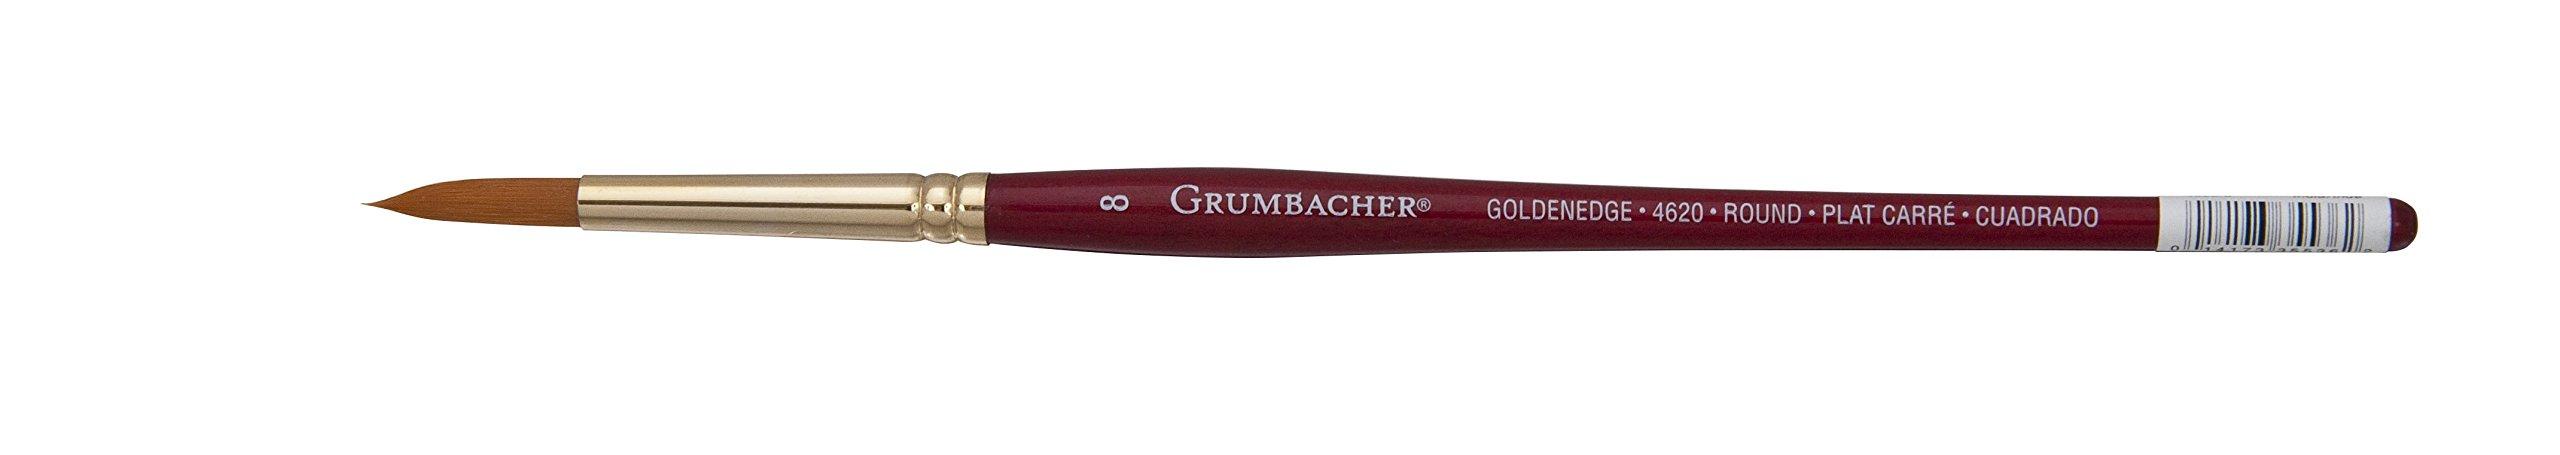 Grumbacher Goldenedge Golden Toray Round Watercolor Brush, Synthetic Bristles, Size 8 (4620.8) by GRUMBACHER